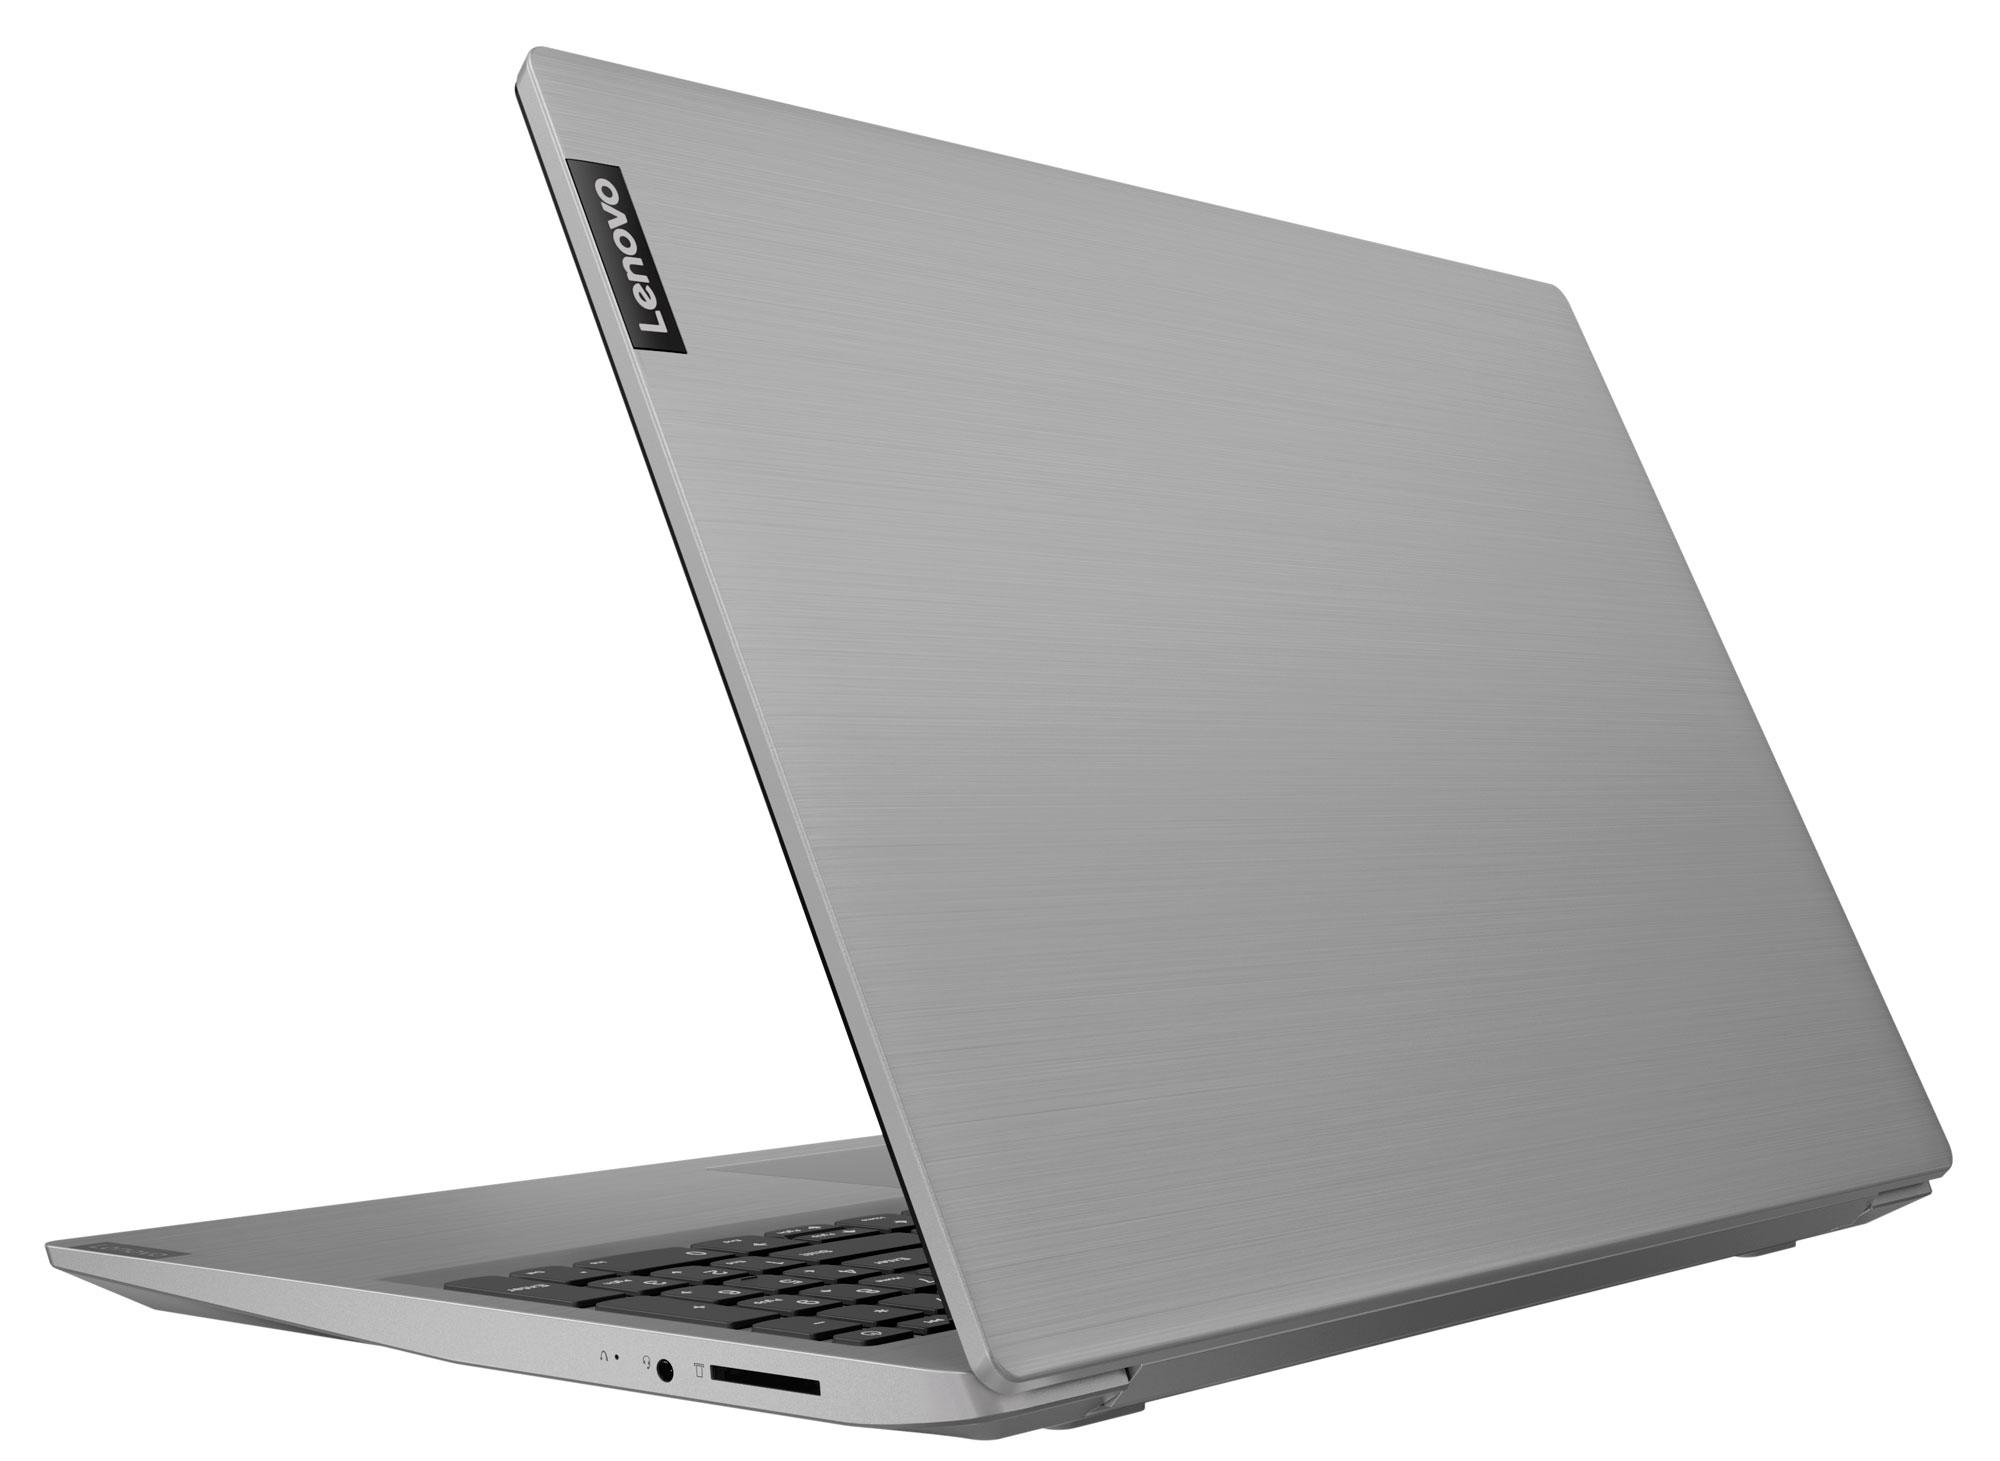 Фото  Ноутбук Lenovo ideapad S145-15AST Grey (81N300BURE)